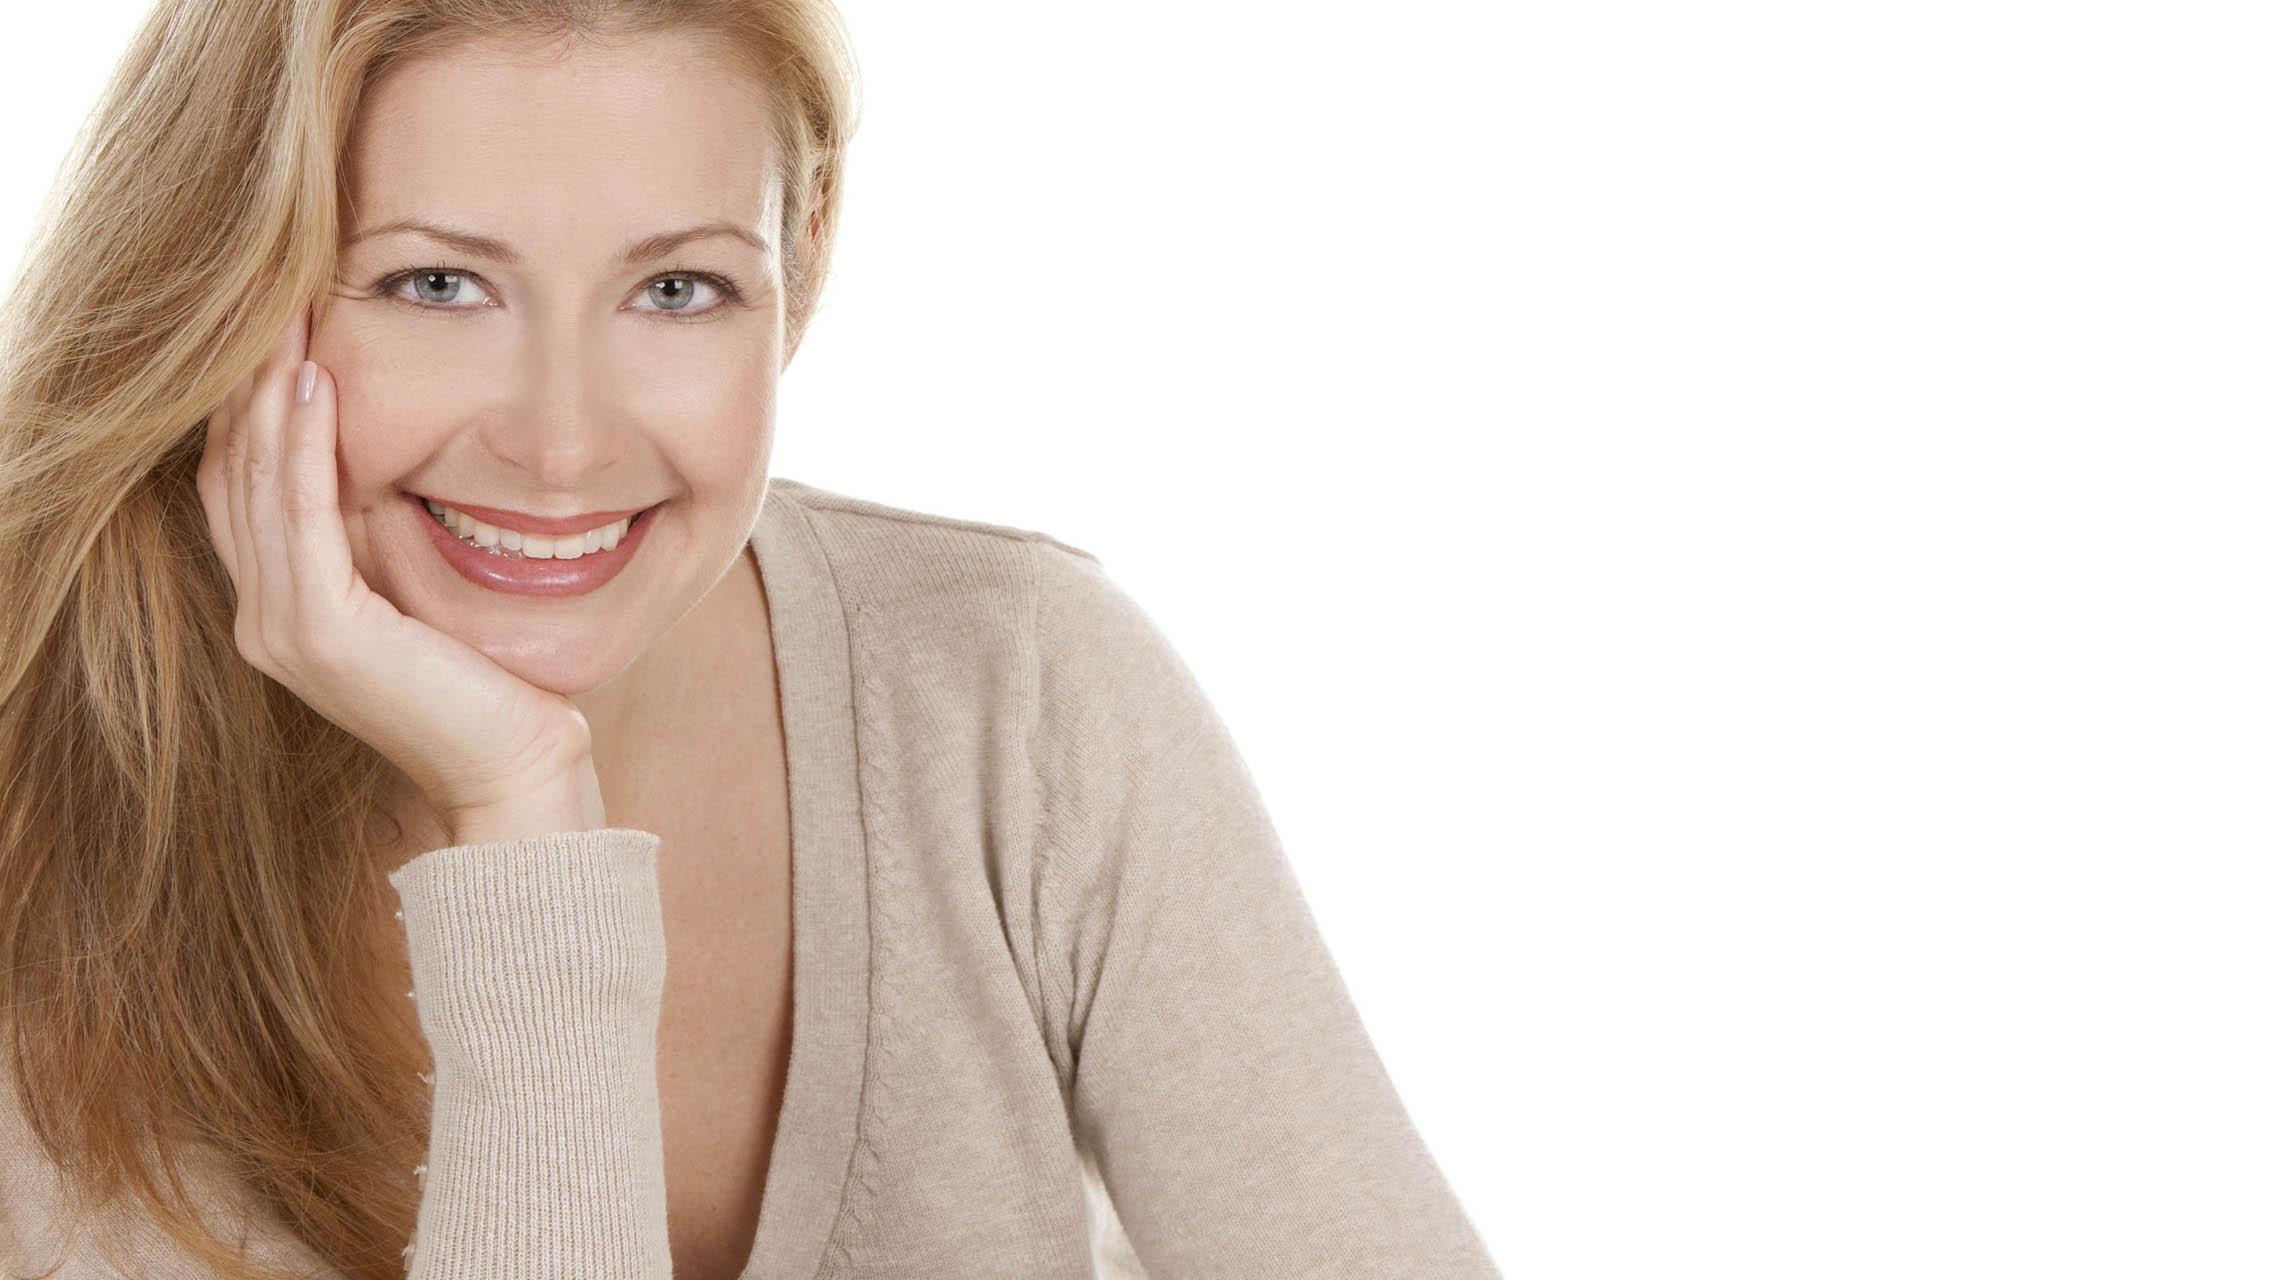 Big bright white smile headshot with a beautiful blond woman